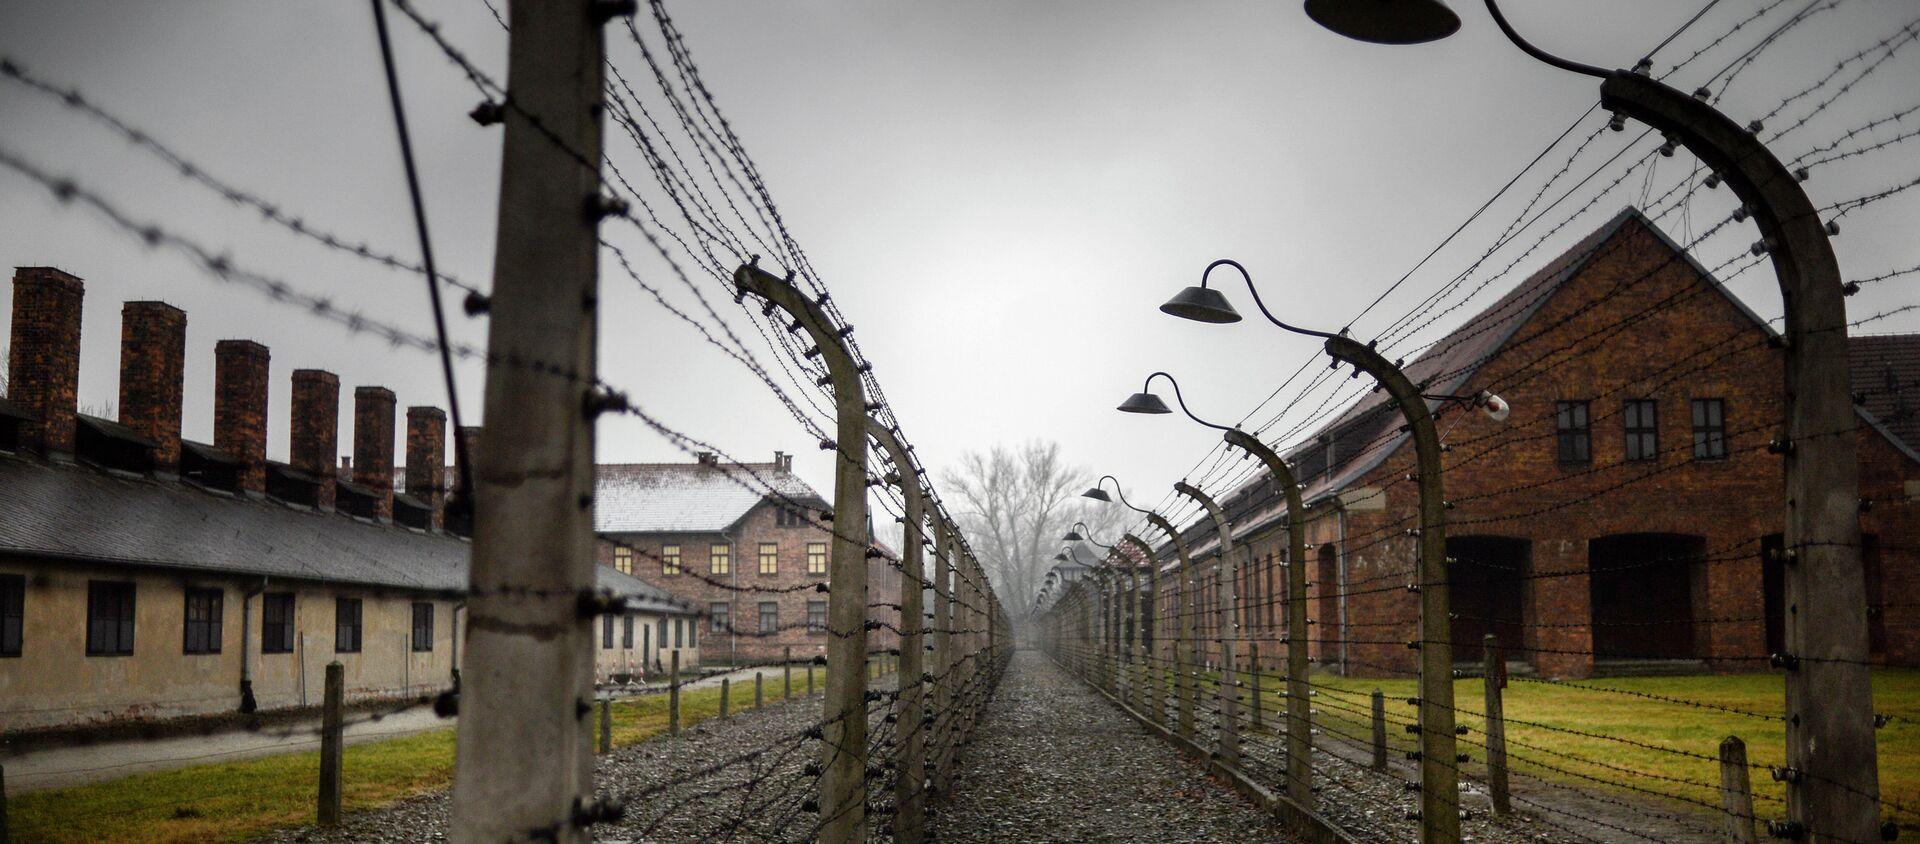 Campo di concentramento Auschwitz  - Sputnik Italia, 1920, 16.09.2020